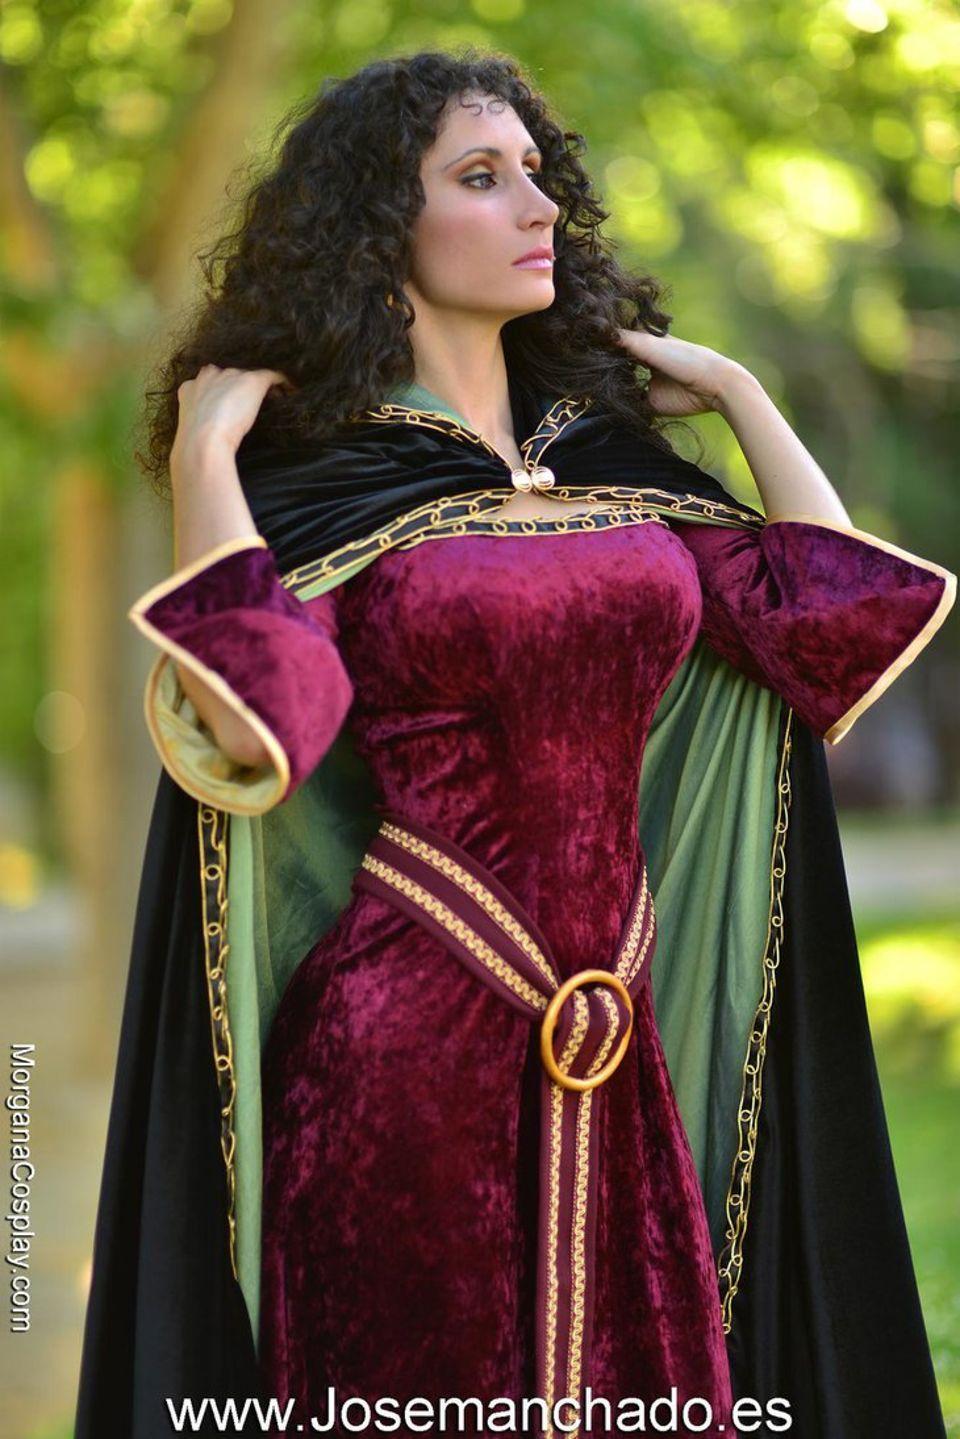 Mother Gothel Costume Rapunzel Tangled Princess Cosplay Dress Cloak Set Outfits